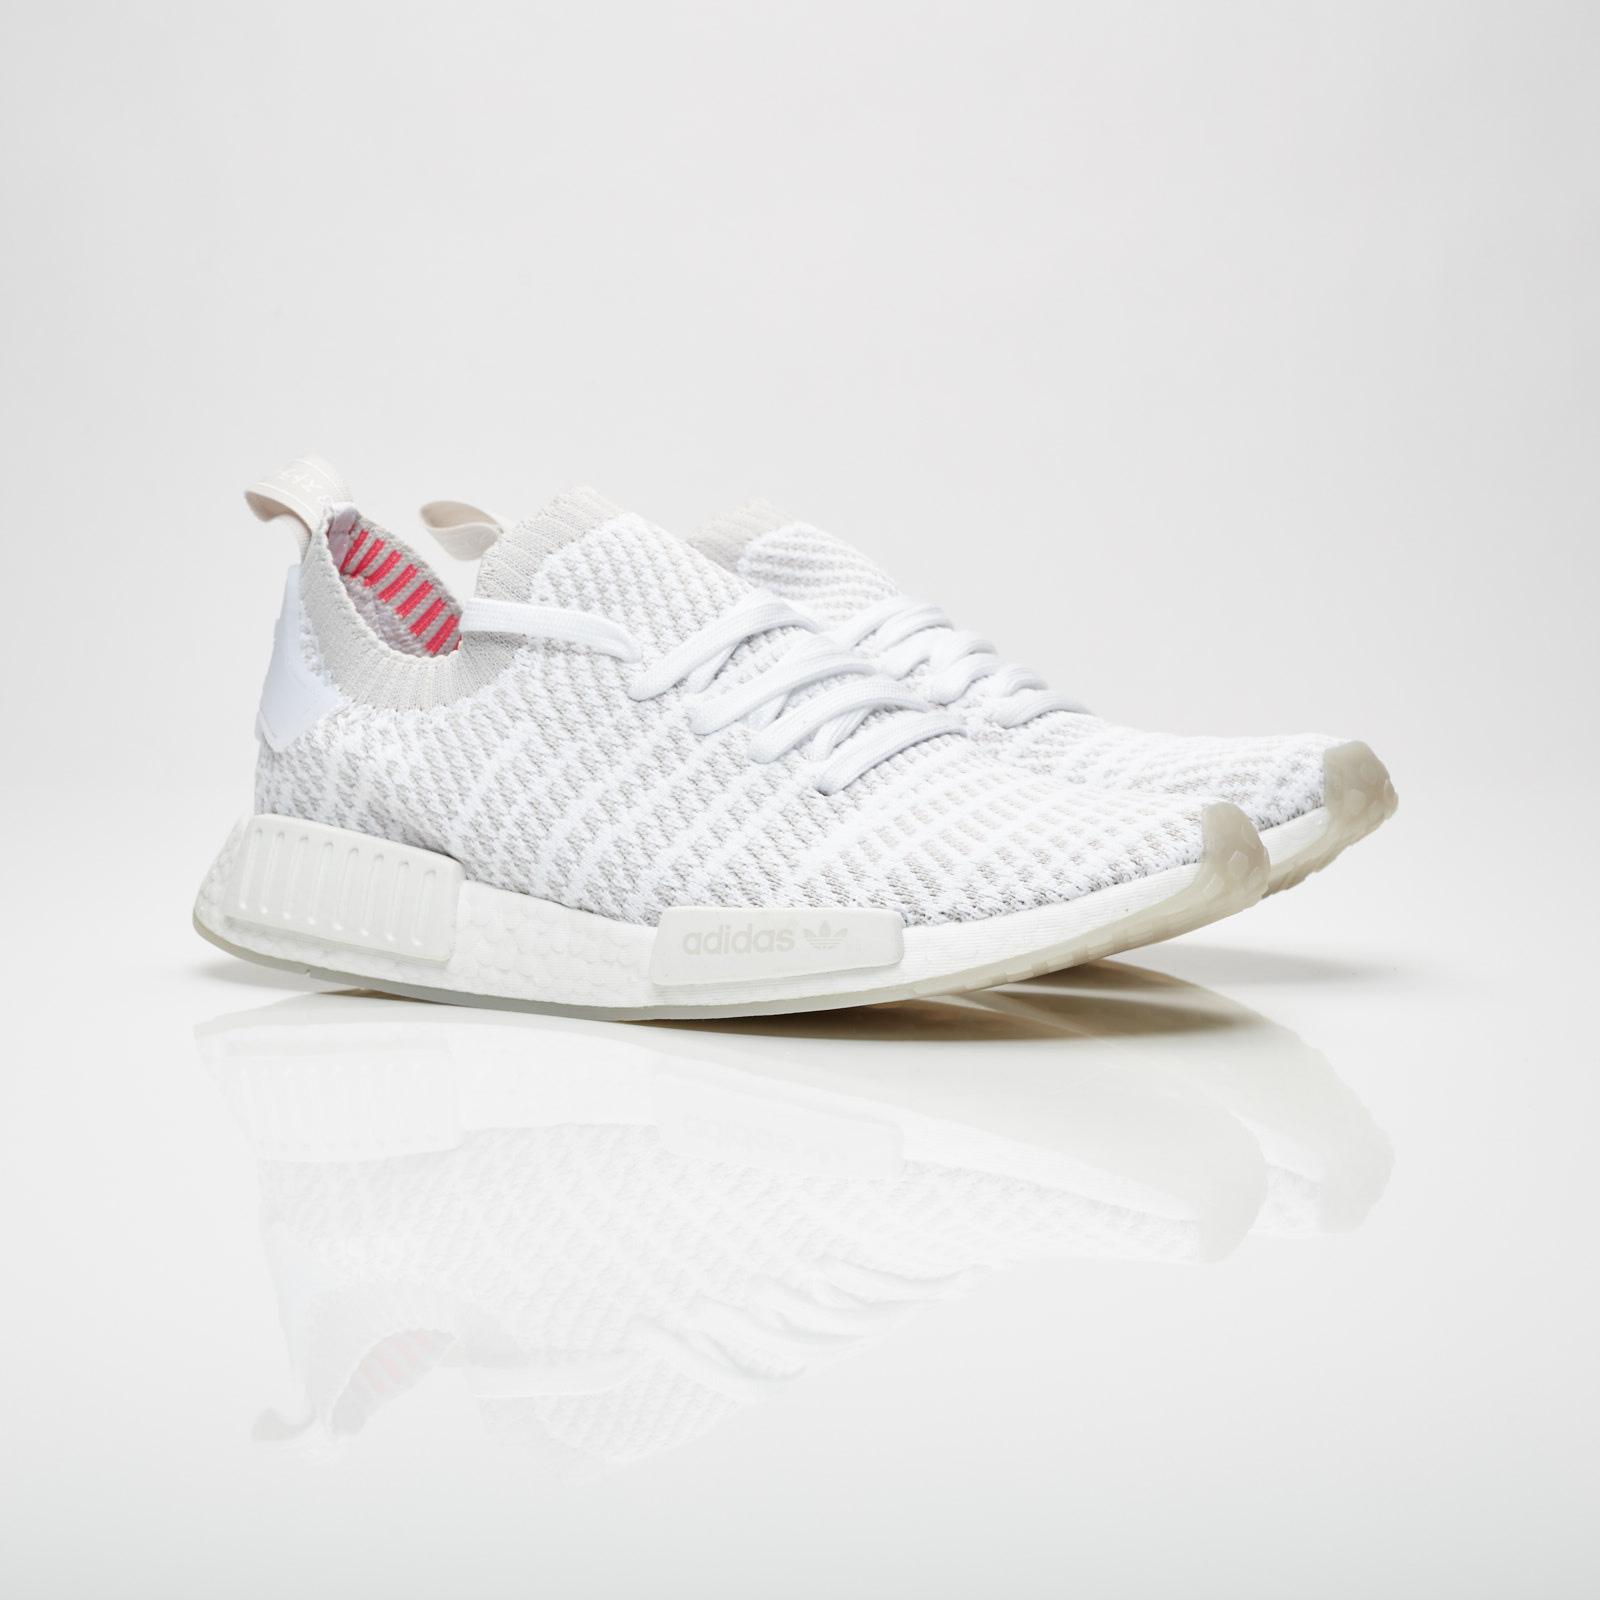 hot sale online ba173 61b99 adidas Originals NMD R1 Stlt PK